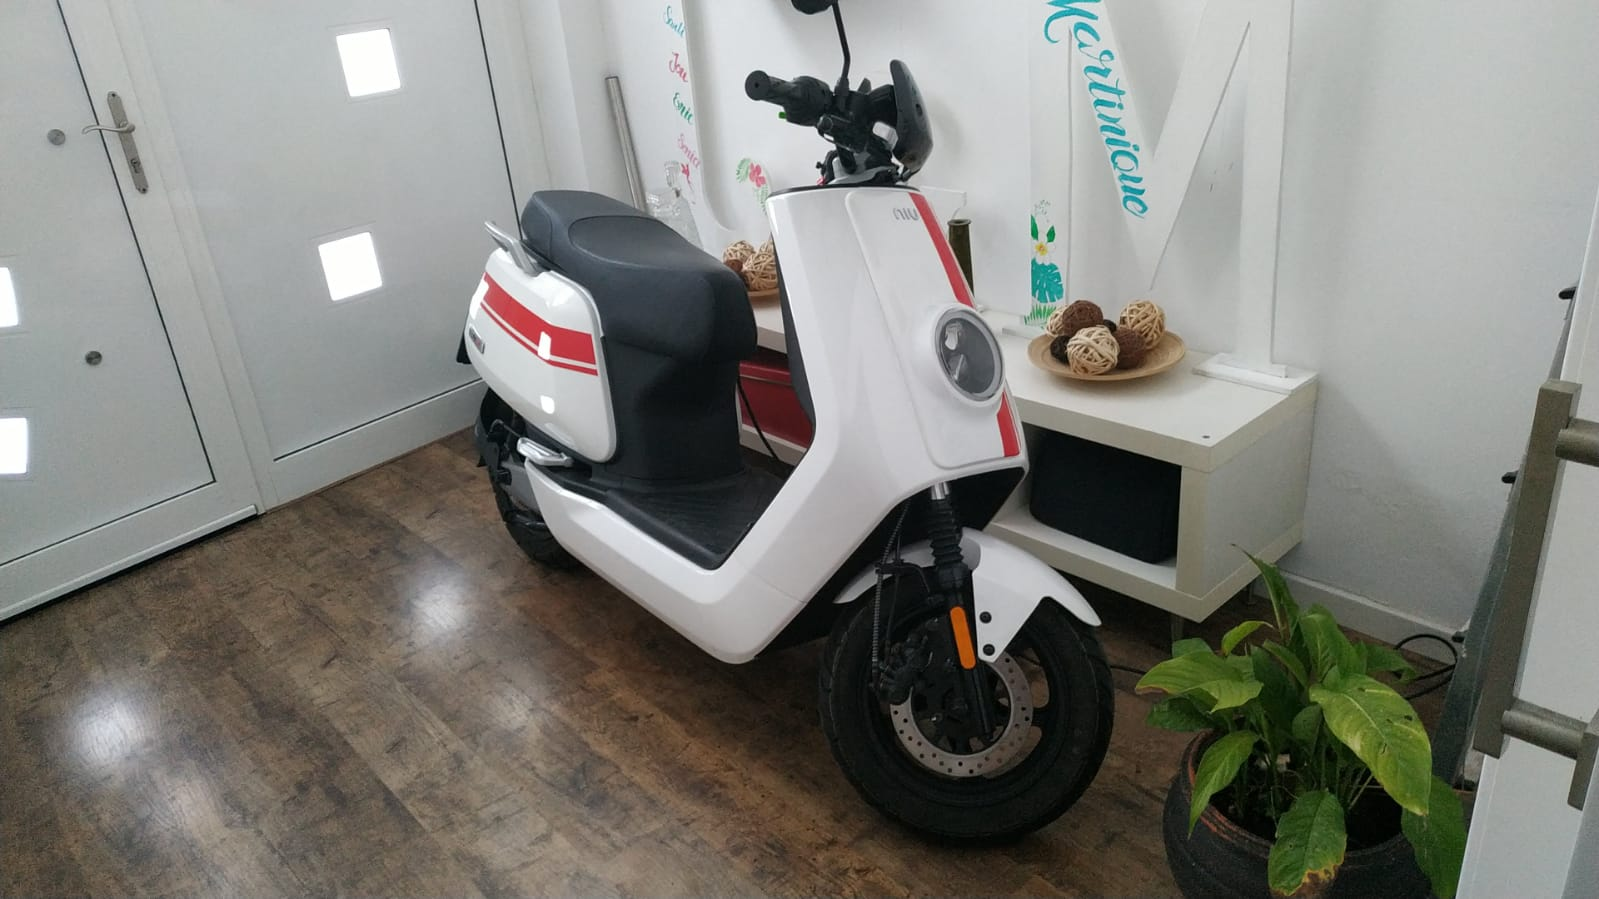 en casa mi moto de prueba NIU